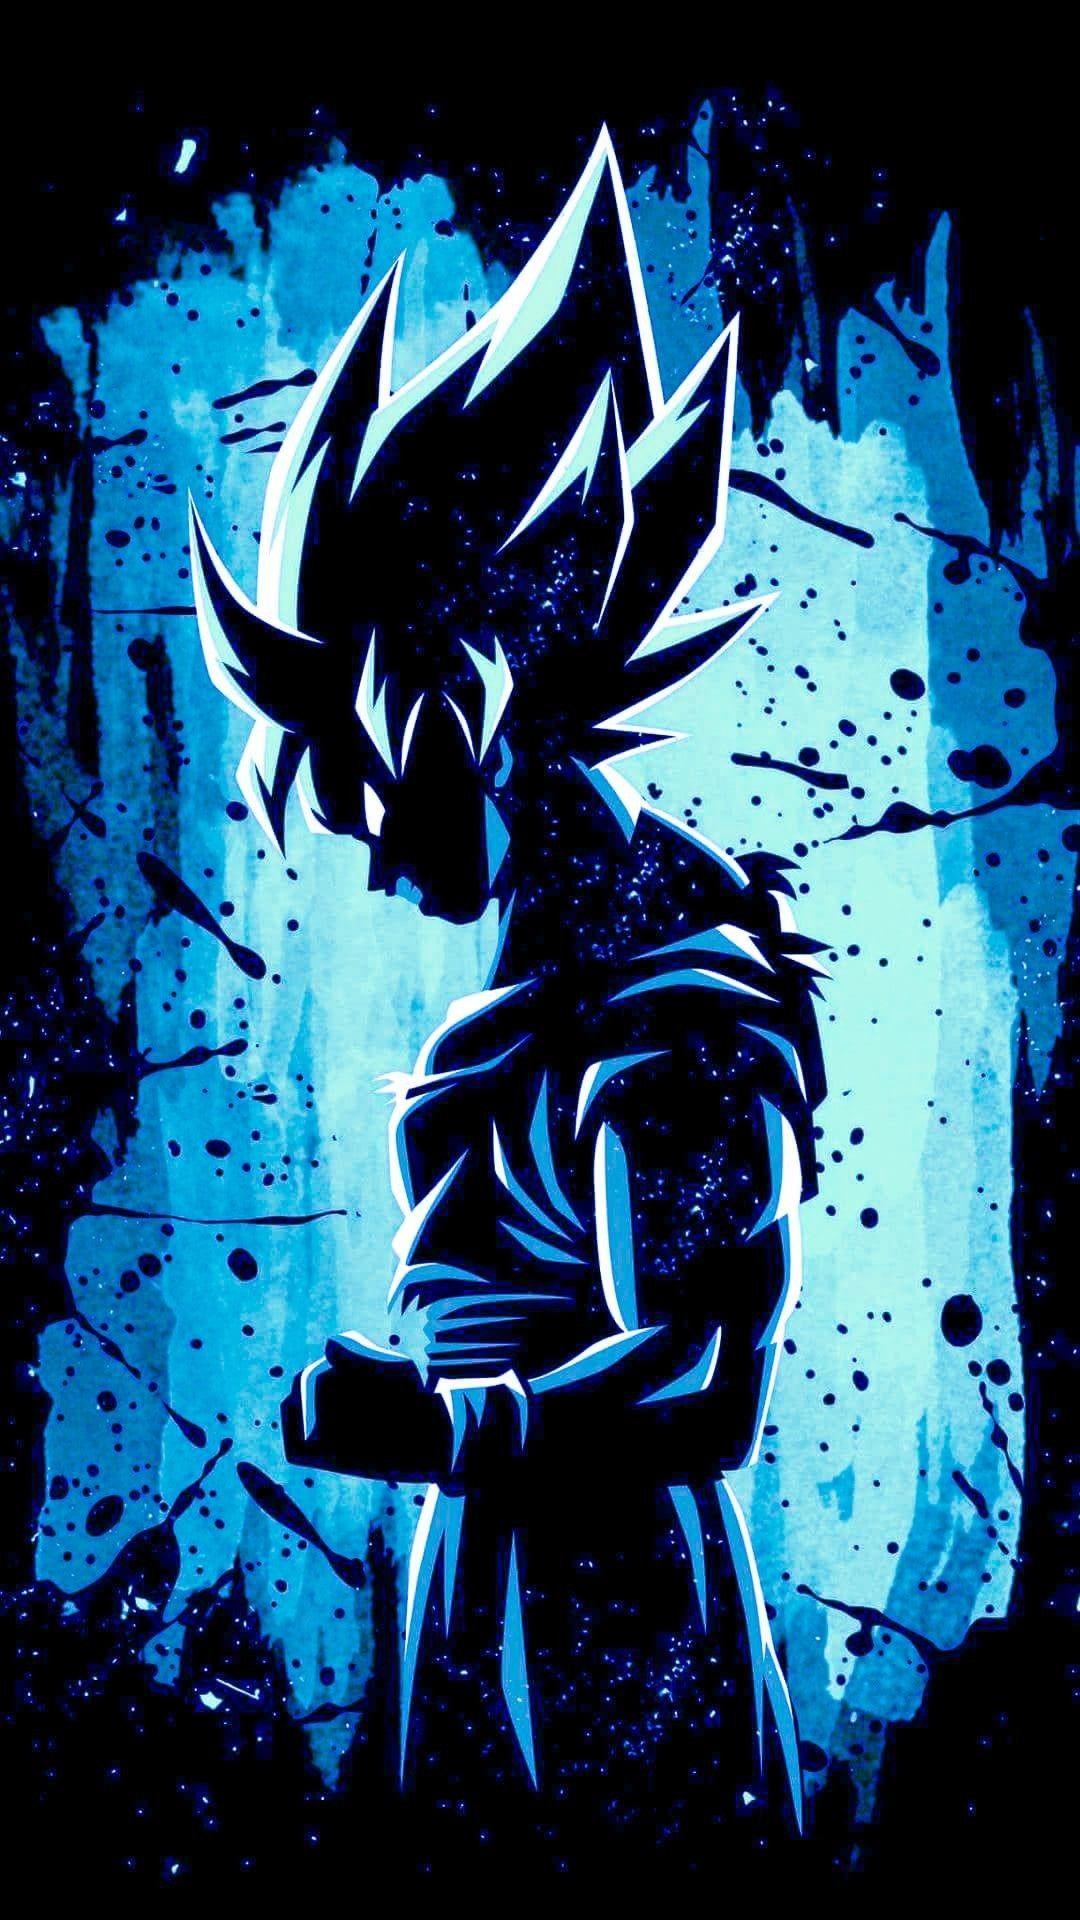 Inspirational Goku Live Wallpaper Iphone 7 In 2020 Dragon Ball Wallpapers Dragon Ball Super Wallpapers Dragon Ball Artwork